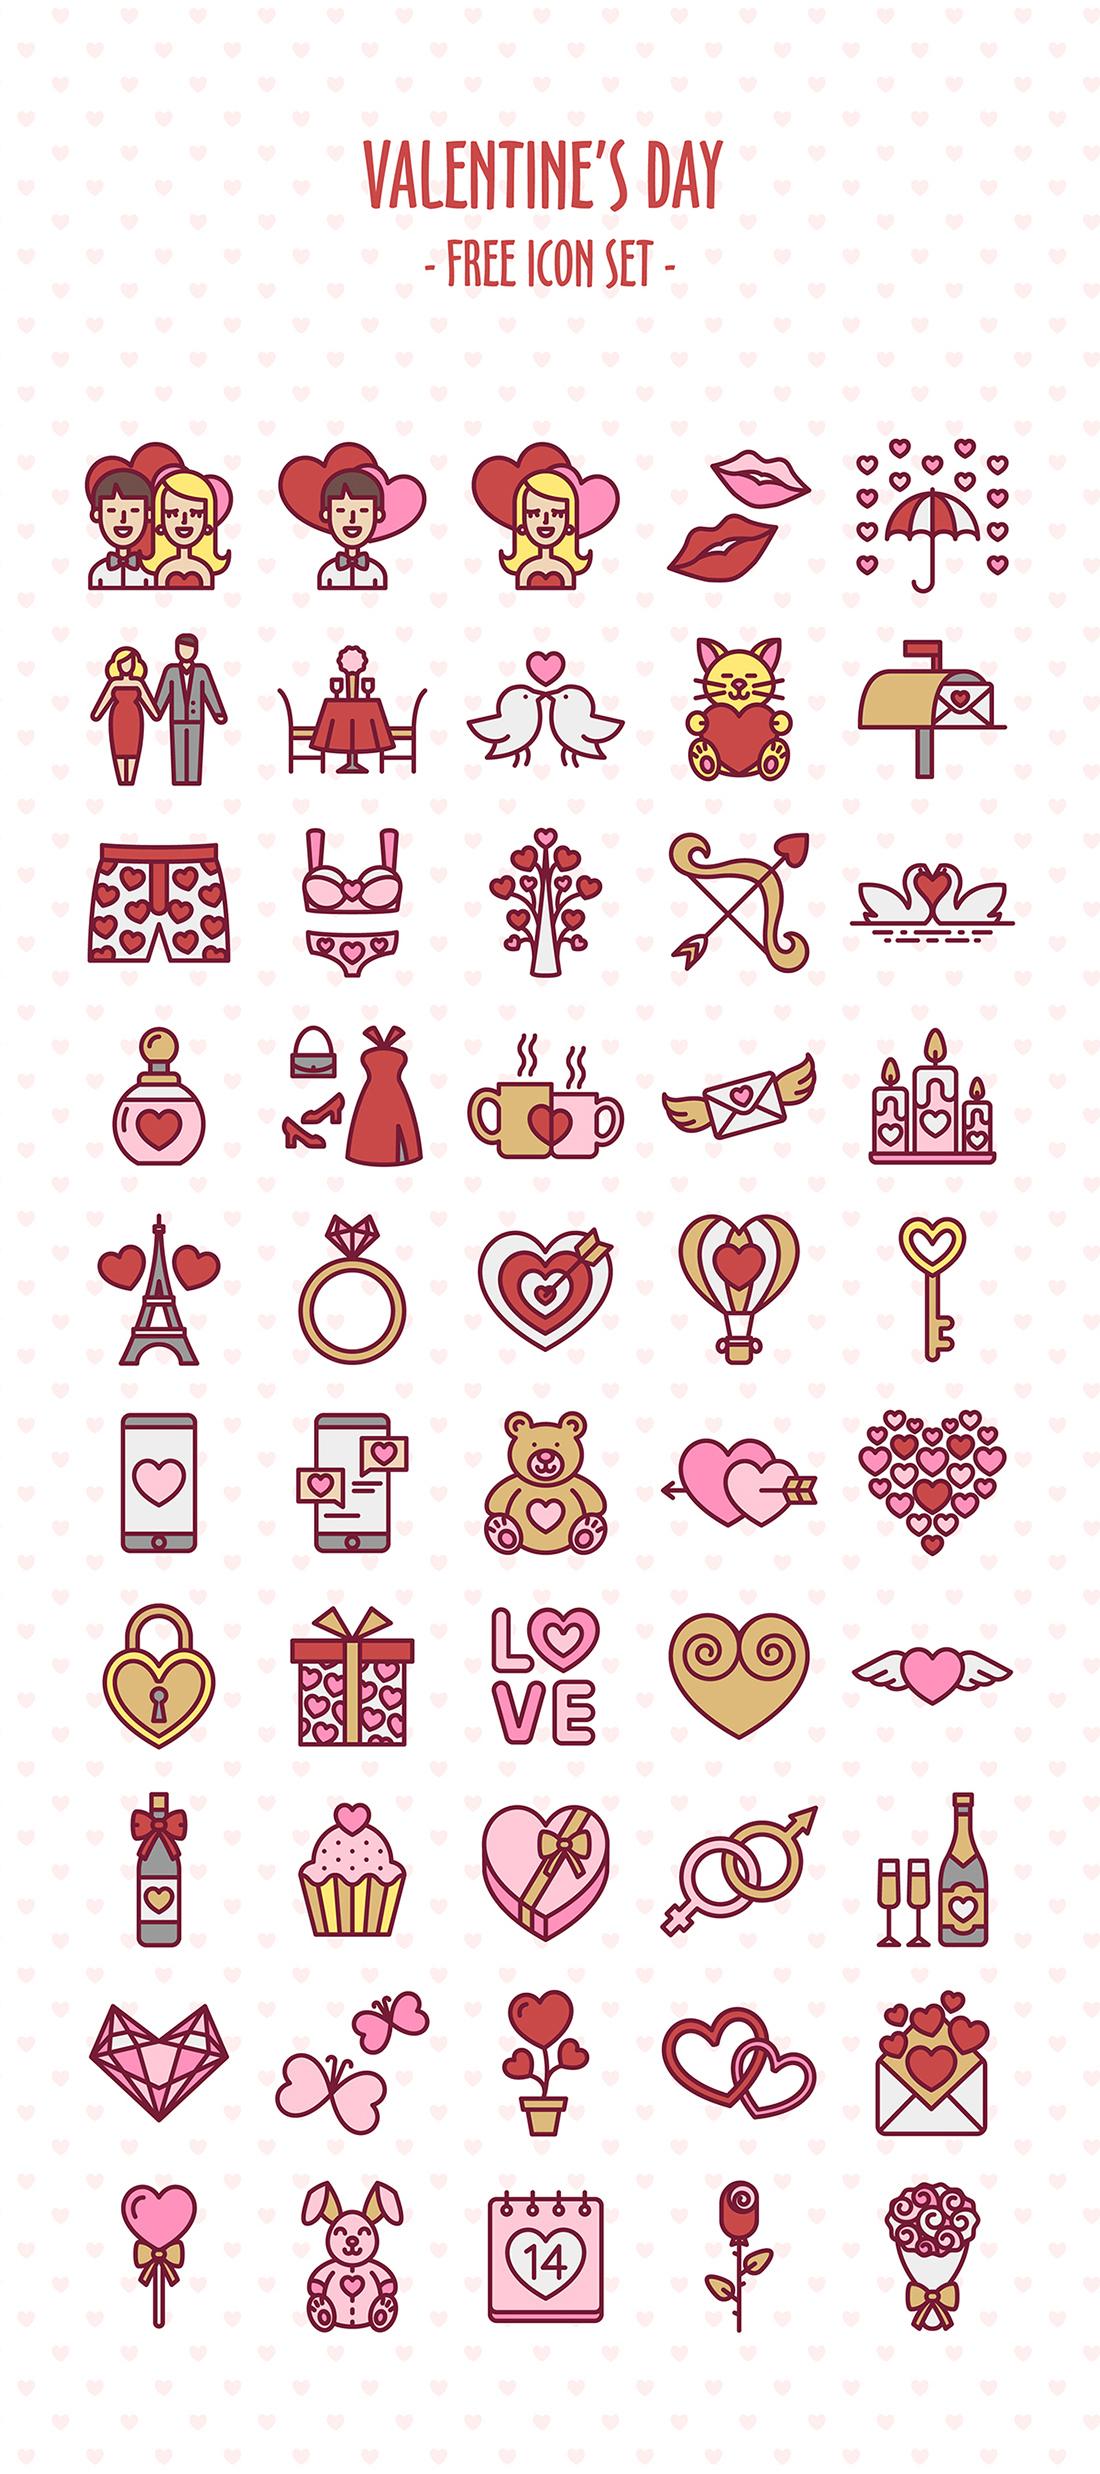 Adobe Portfolio Icon icons line icon flat flat icon free download freebie Love valentine valentines day icon set pink red cute